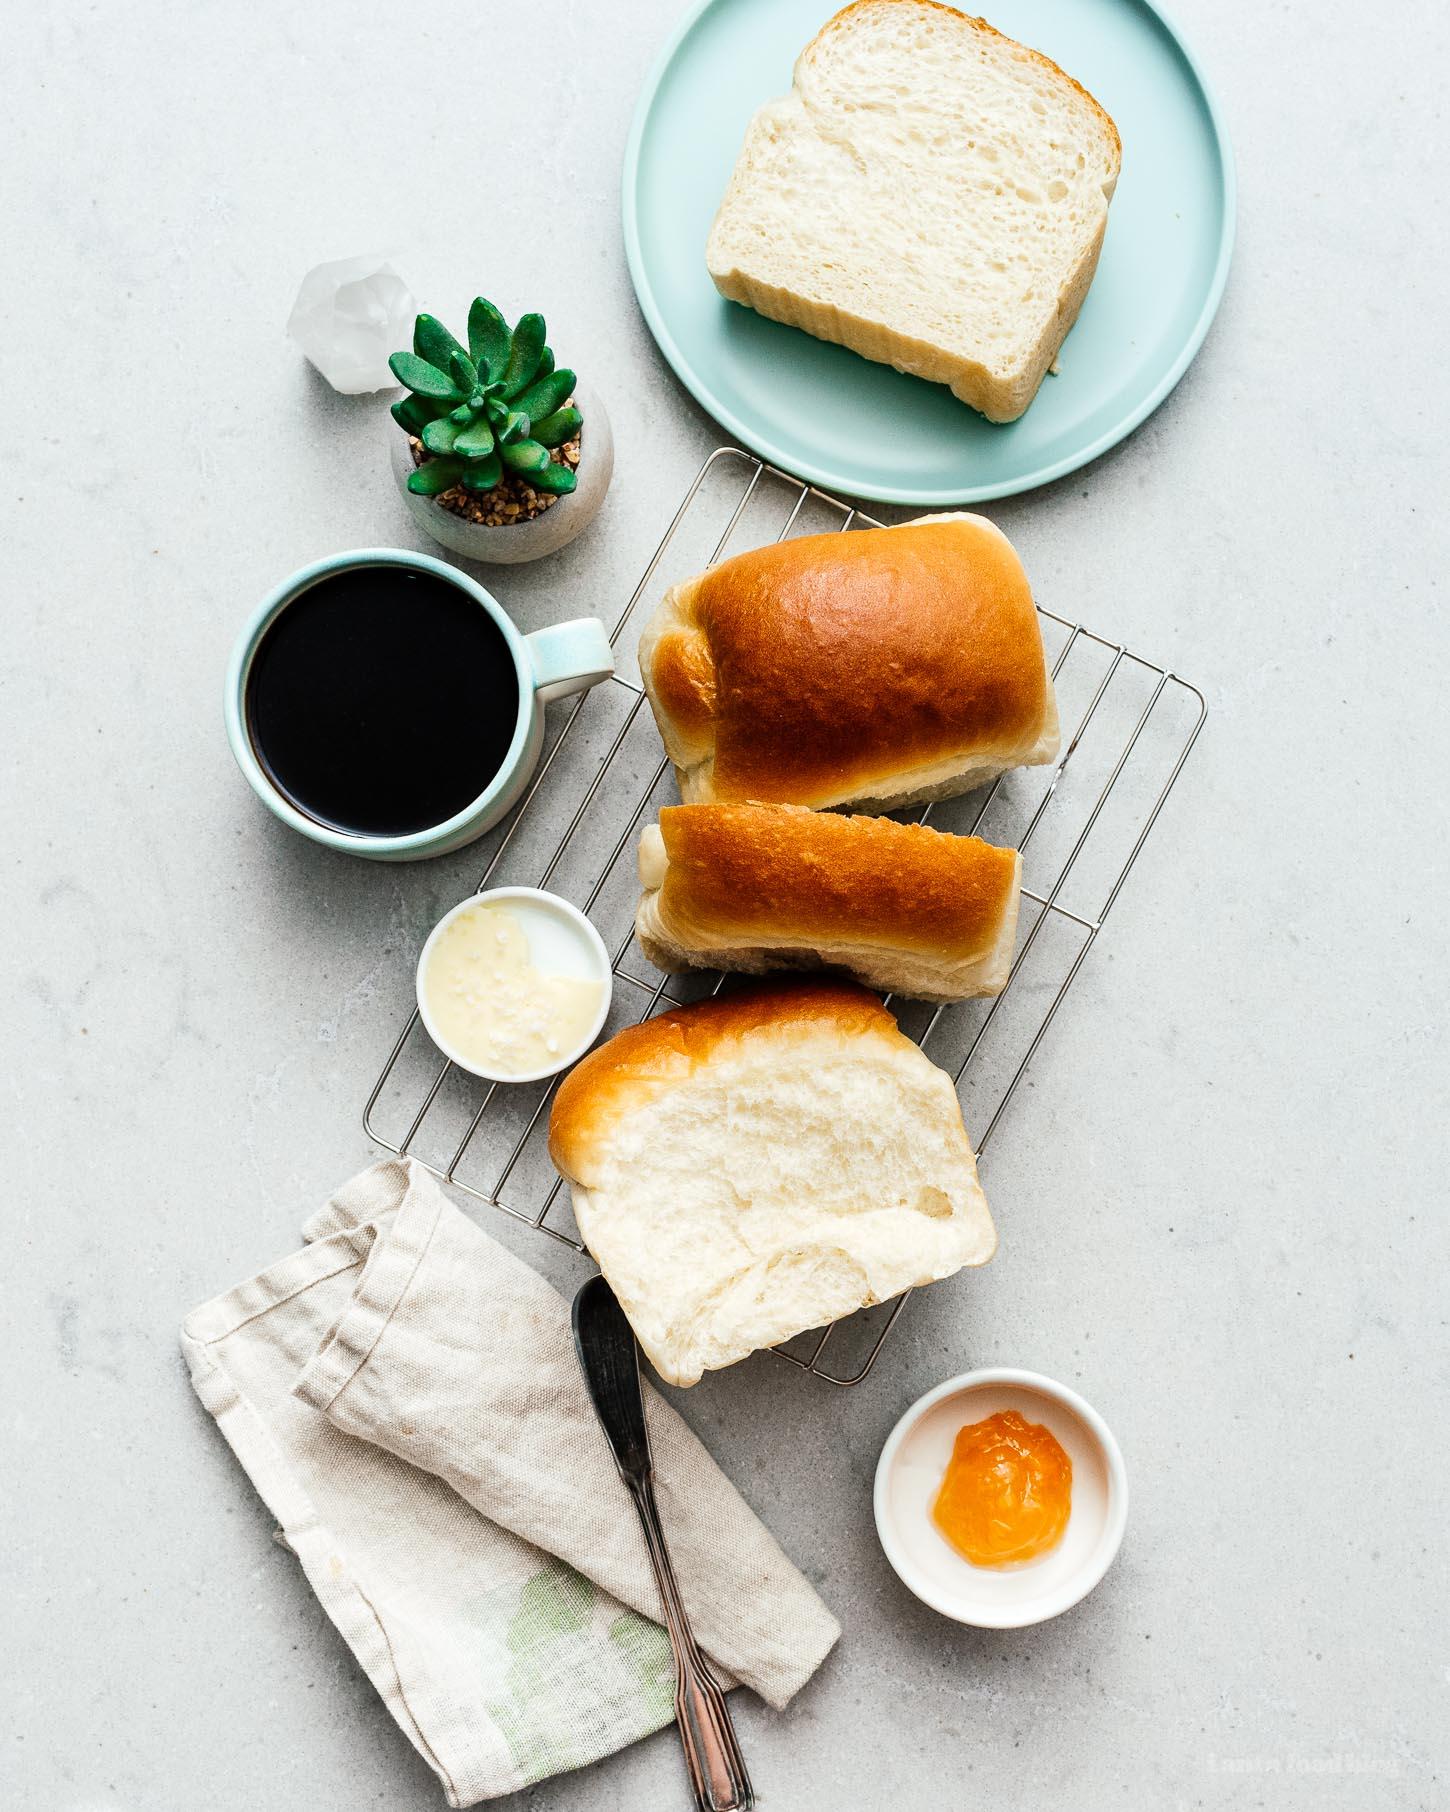 hokkaido milk bread   www.iamafoodblog.com